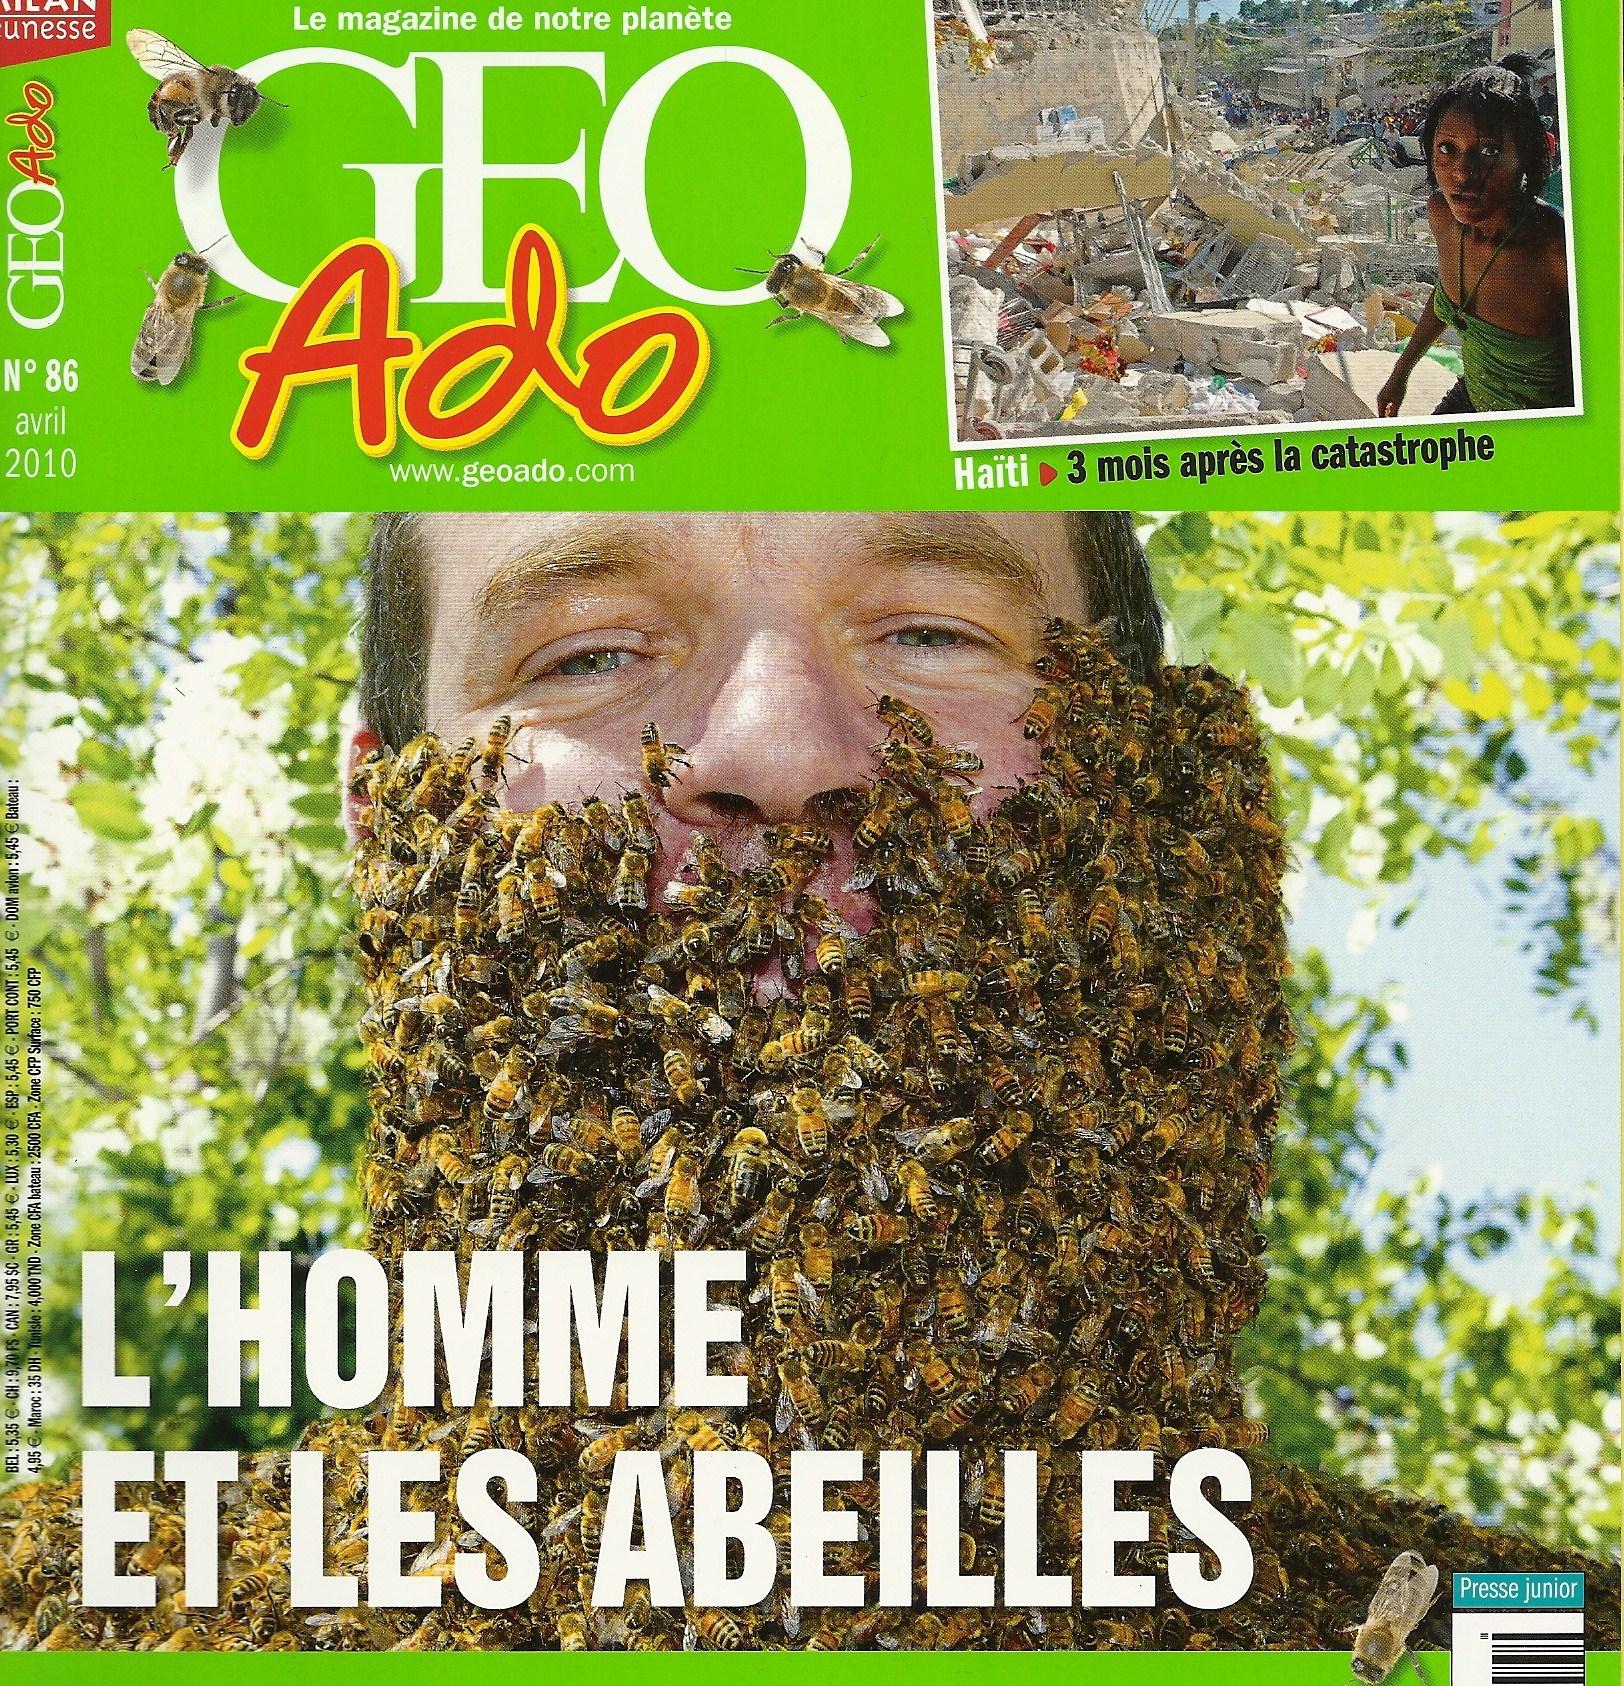 http://sd-2.archive-host.com/membres/images/39220276846670516/MAG_GEO_ADO_AVRIL_2010.jpg